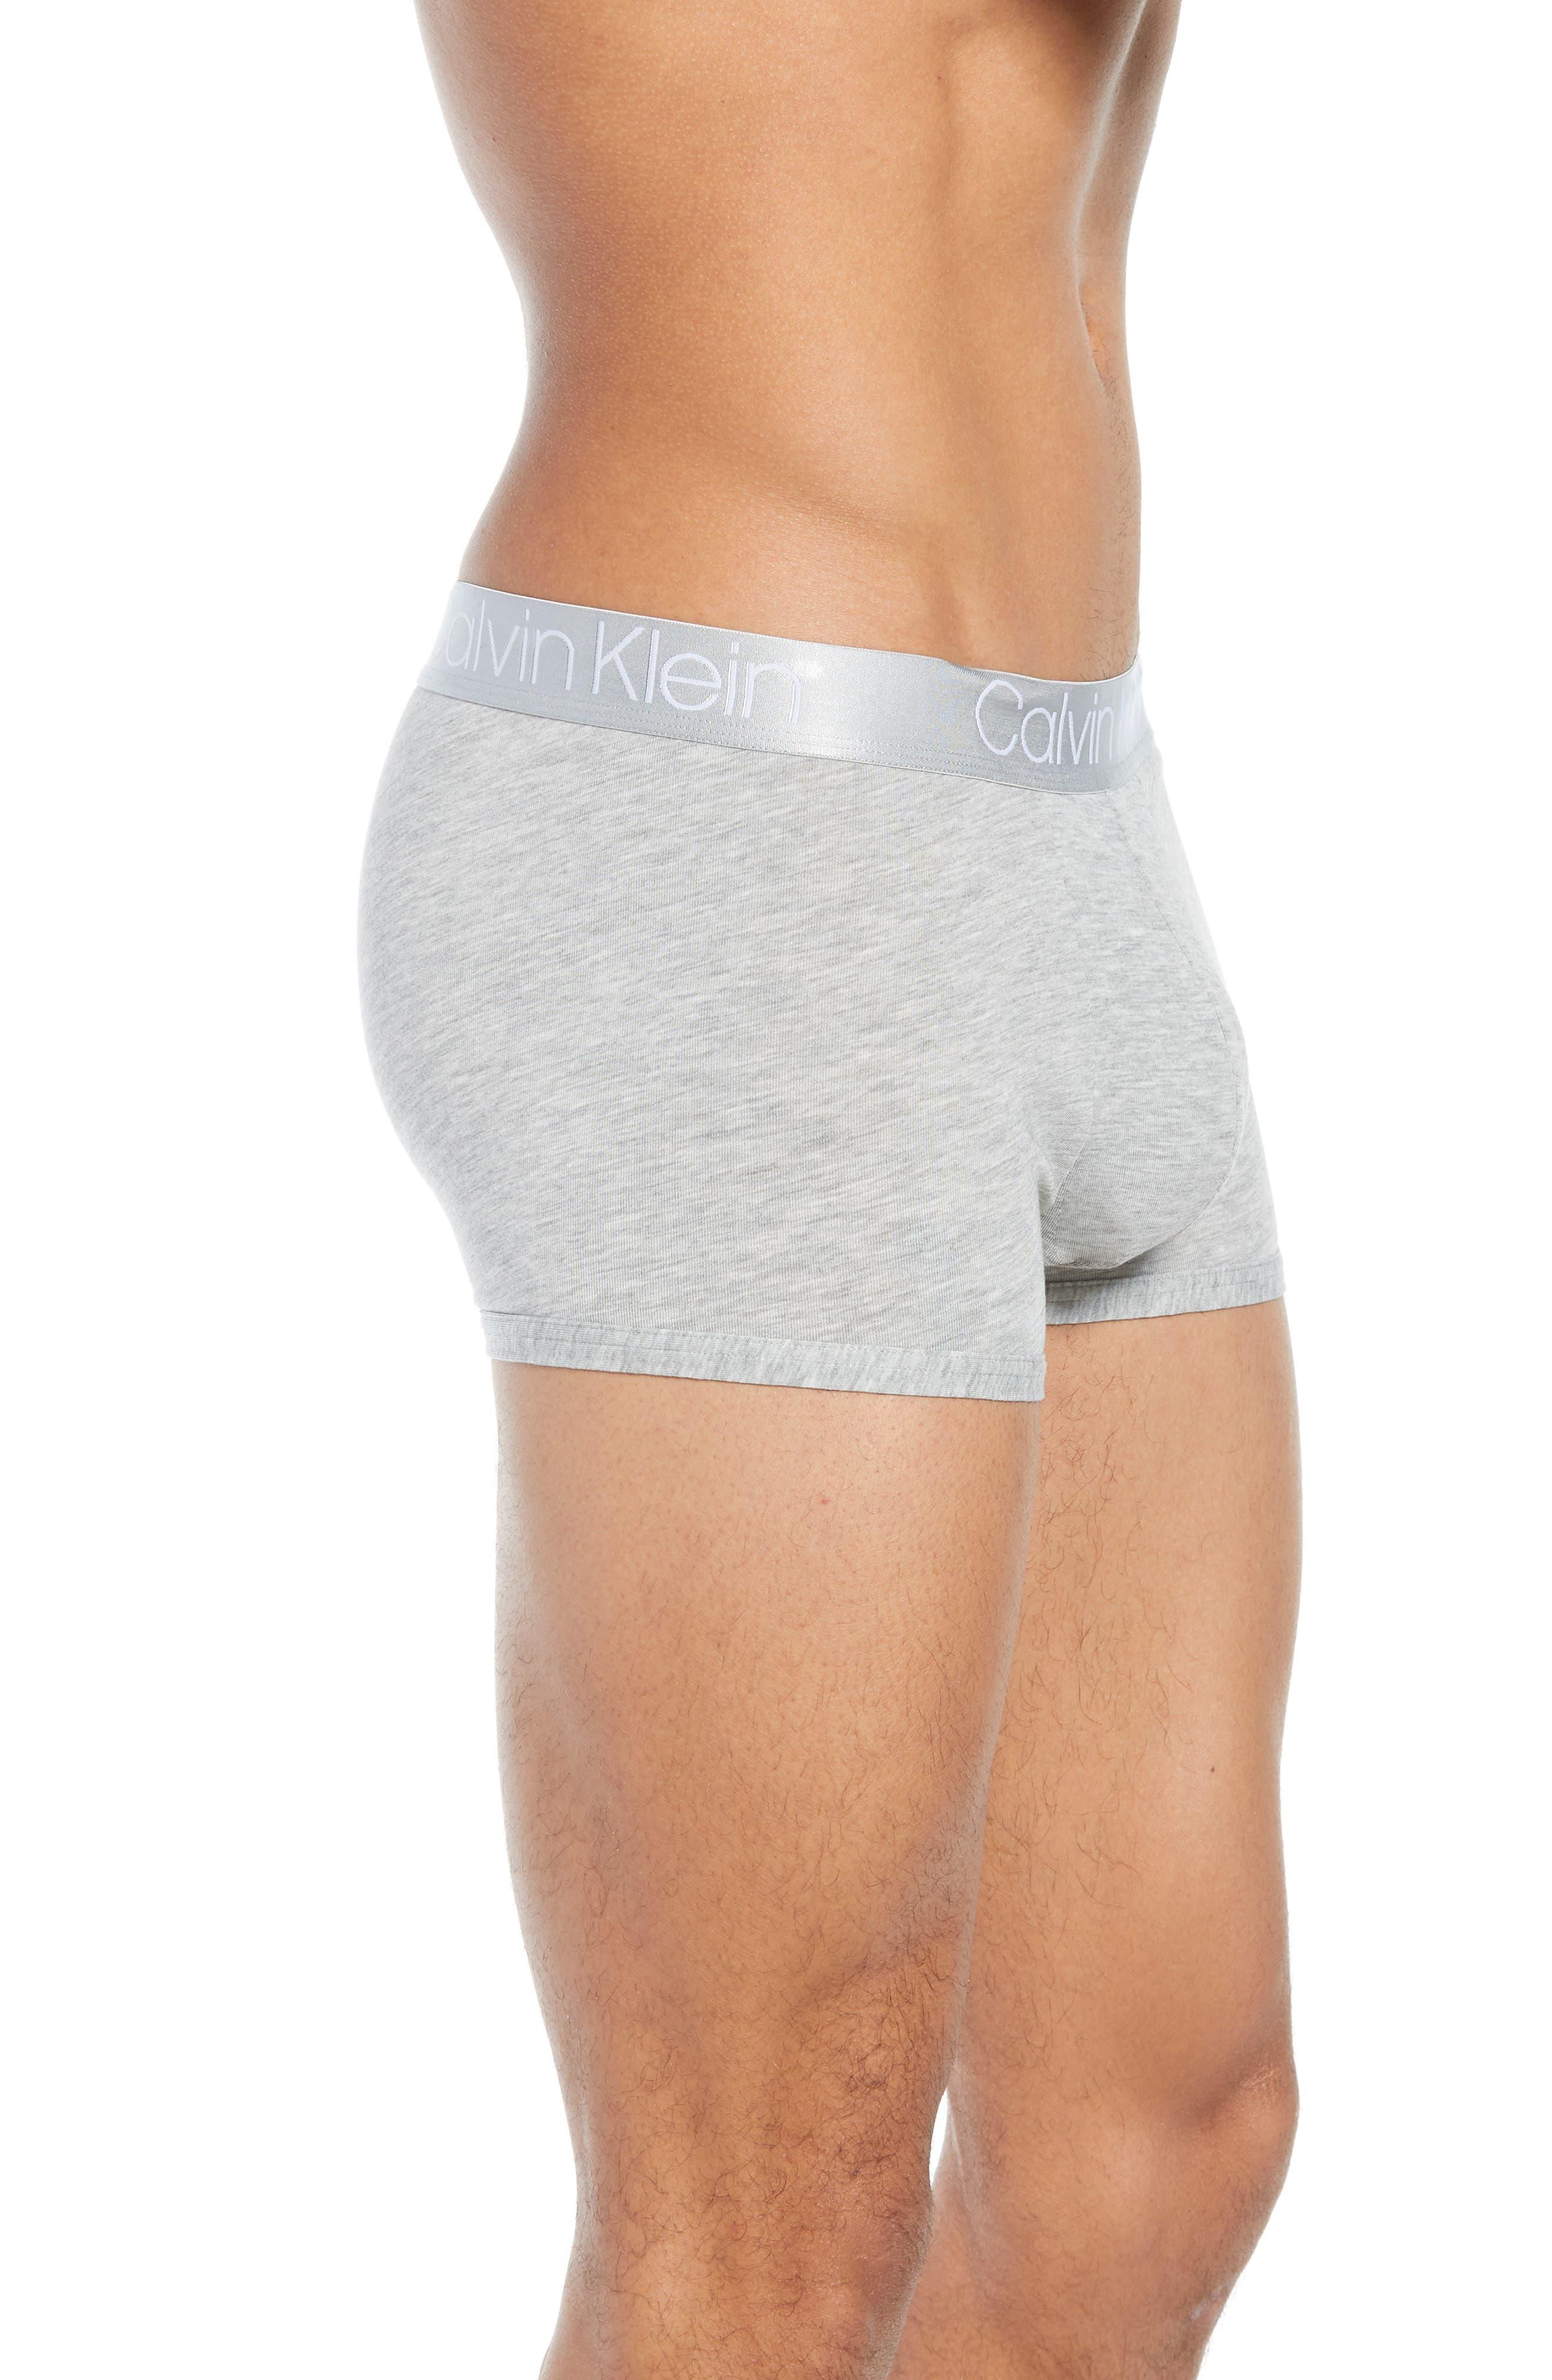 CALVIN KLEIN, Ultrasoft Stretch Modal Trunks, Alternate thumbnail 3, color, GREY HEATHER/ WHITE